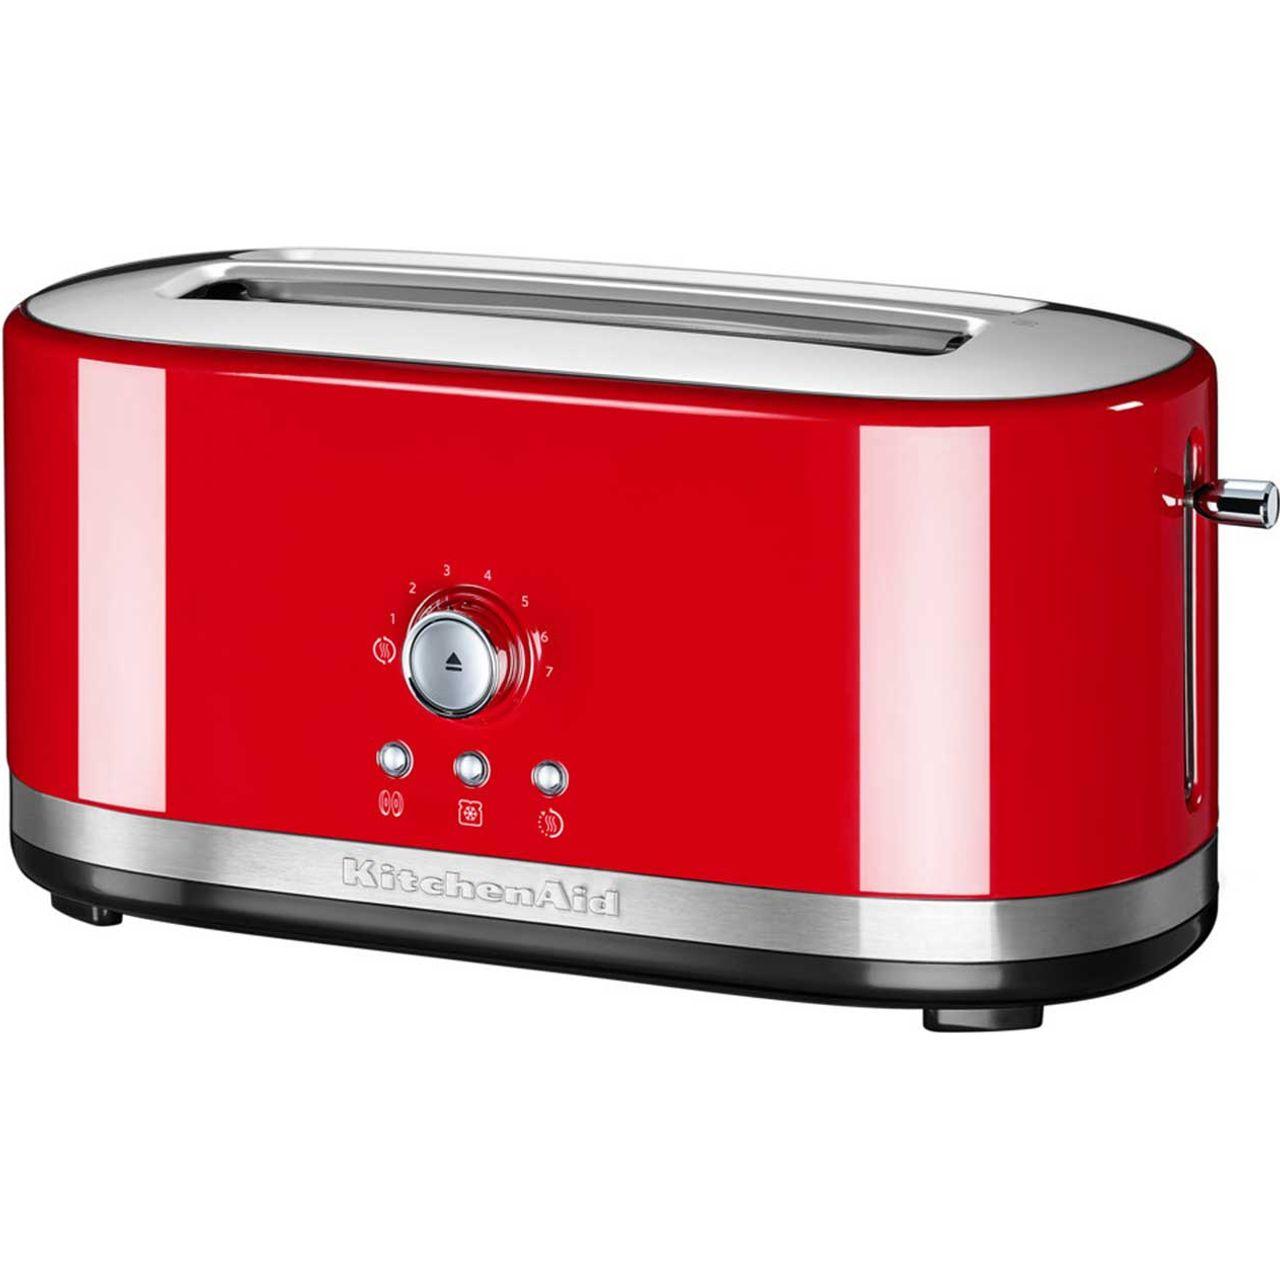 5KMT4116BCU_SI   KitchenAid 4 Slice Toaster   Silver   ao.com on 4-slice toaster, bread toasters, delonghi toaster, commercial toasters, hamilton beach toaster, delonghi toasters, electric toaster, bagel toaster, a toaster, 4 slice toaster, tangerine toaster, stainless steel toaster, conveyor toaster, sunbeam toaster, red toaster, bella toaster, toaster oven, dualit toaster, cuisinart toaster, commercial toaster, retro toaster, almond colored toaster, viking toaster, oster toaster, cuisinart toaster oven, bread toaster, green toaster, best toaster,